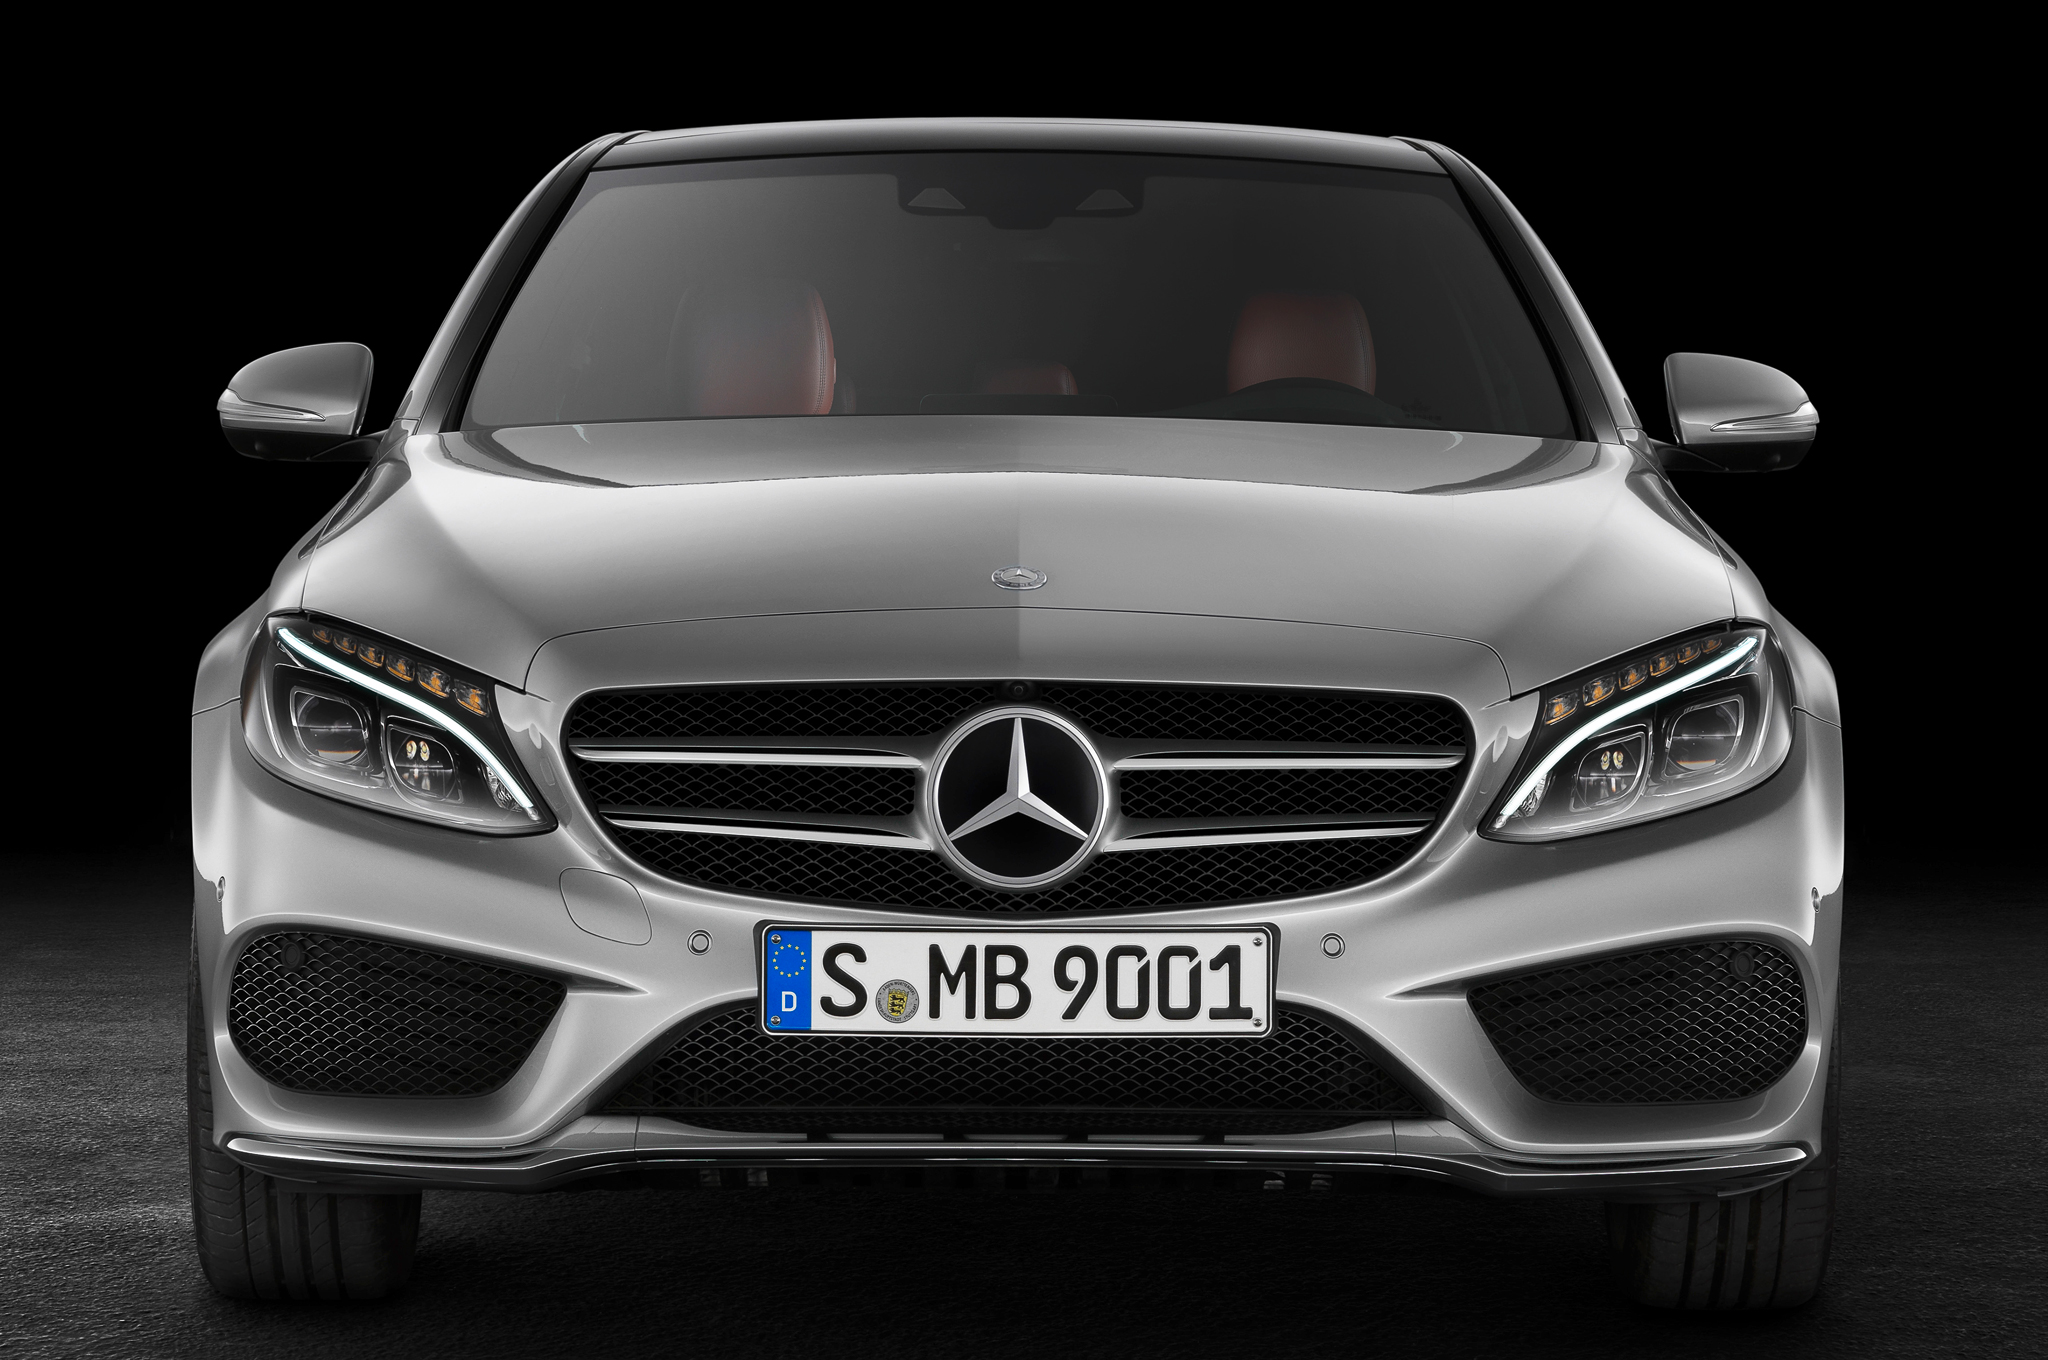 2015 Mercedes-Benz C-Class Front End Design